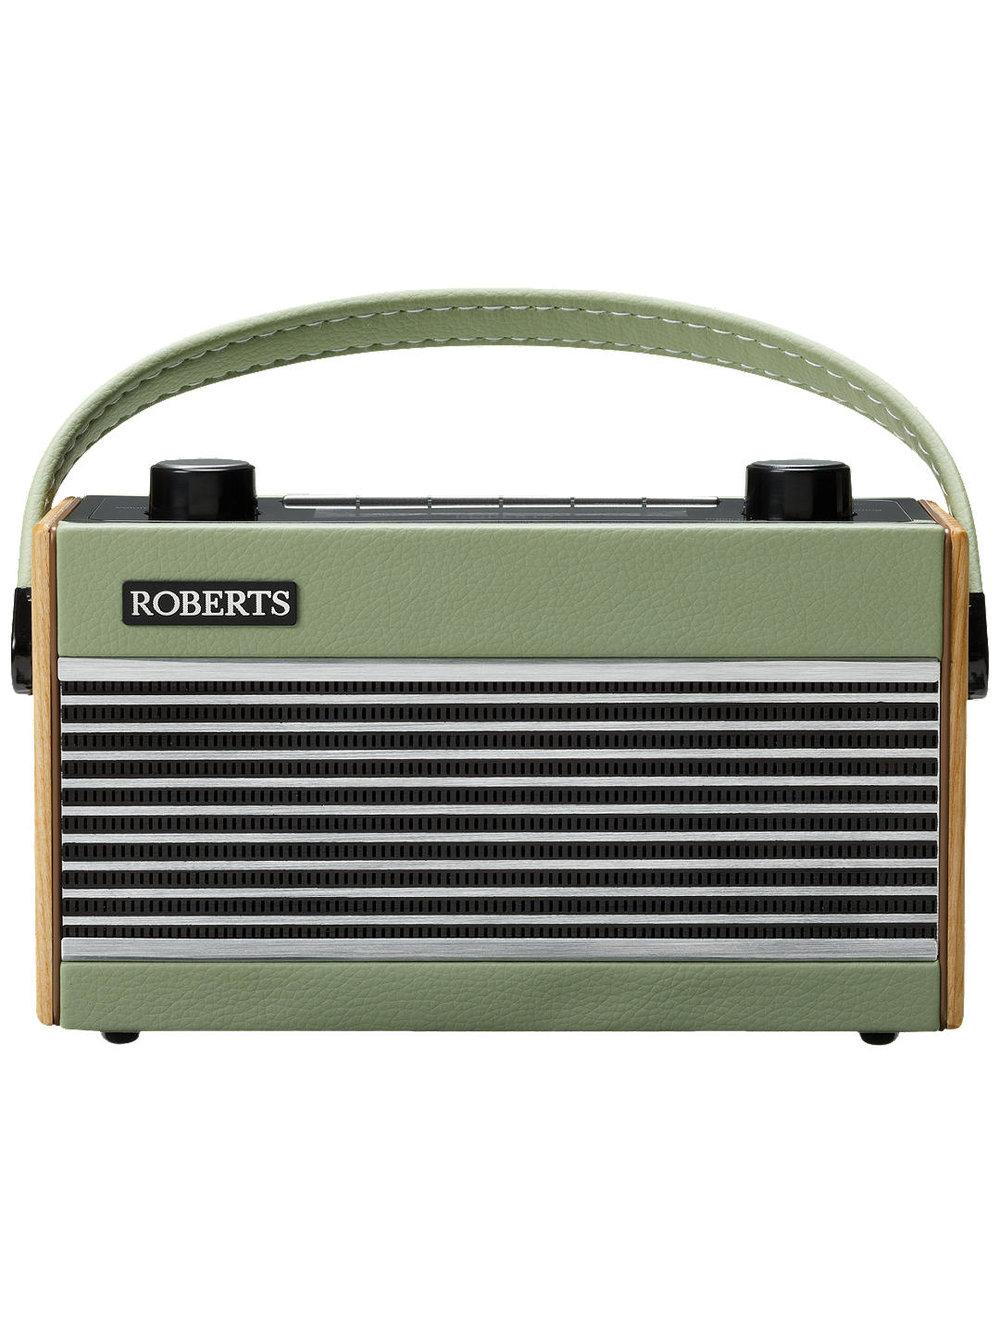 Roberts Radio - £99